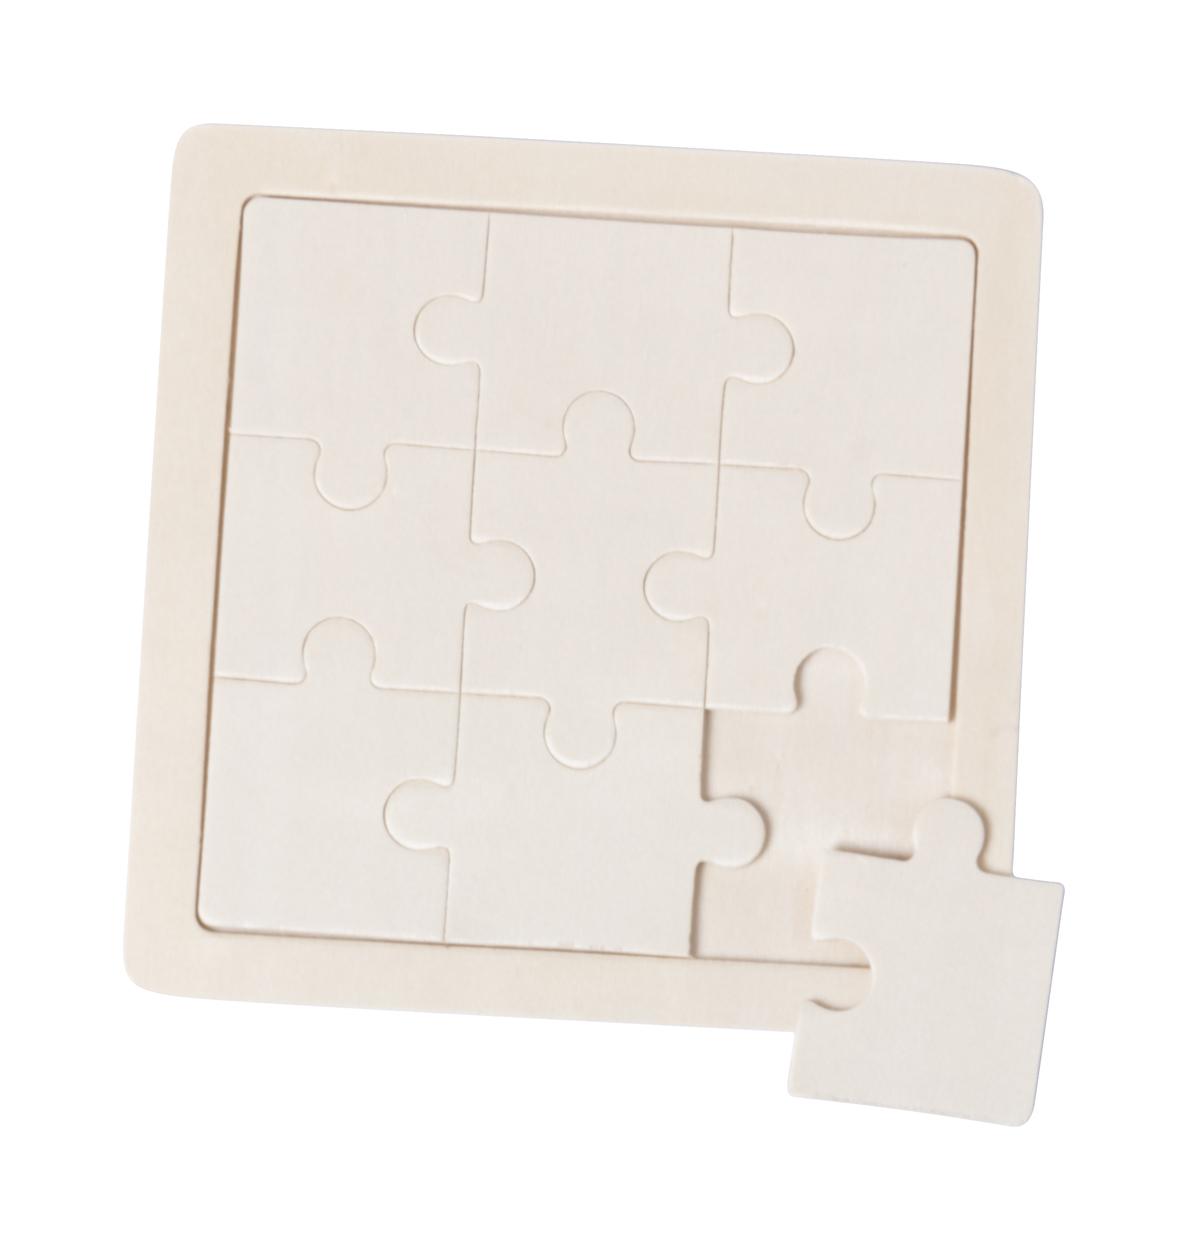 Sutrox puzzle